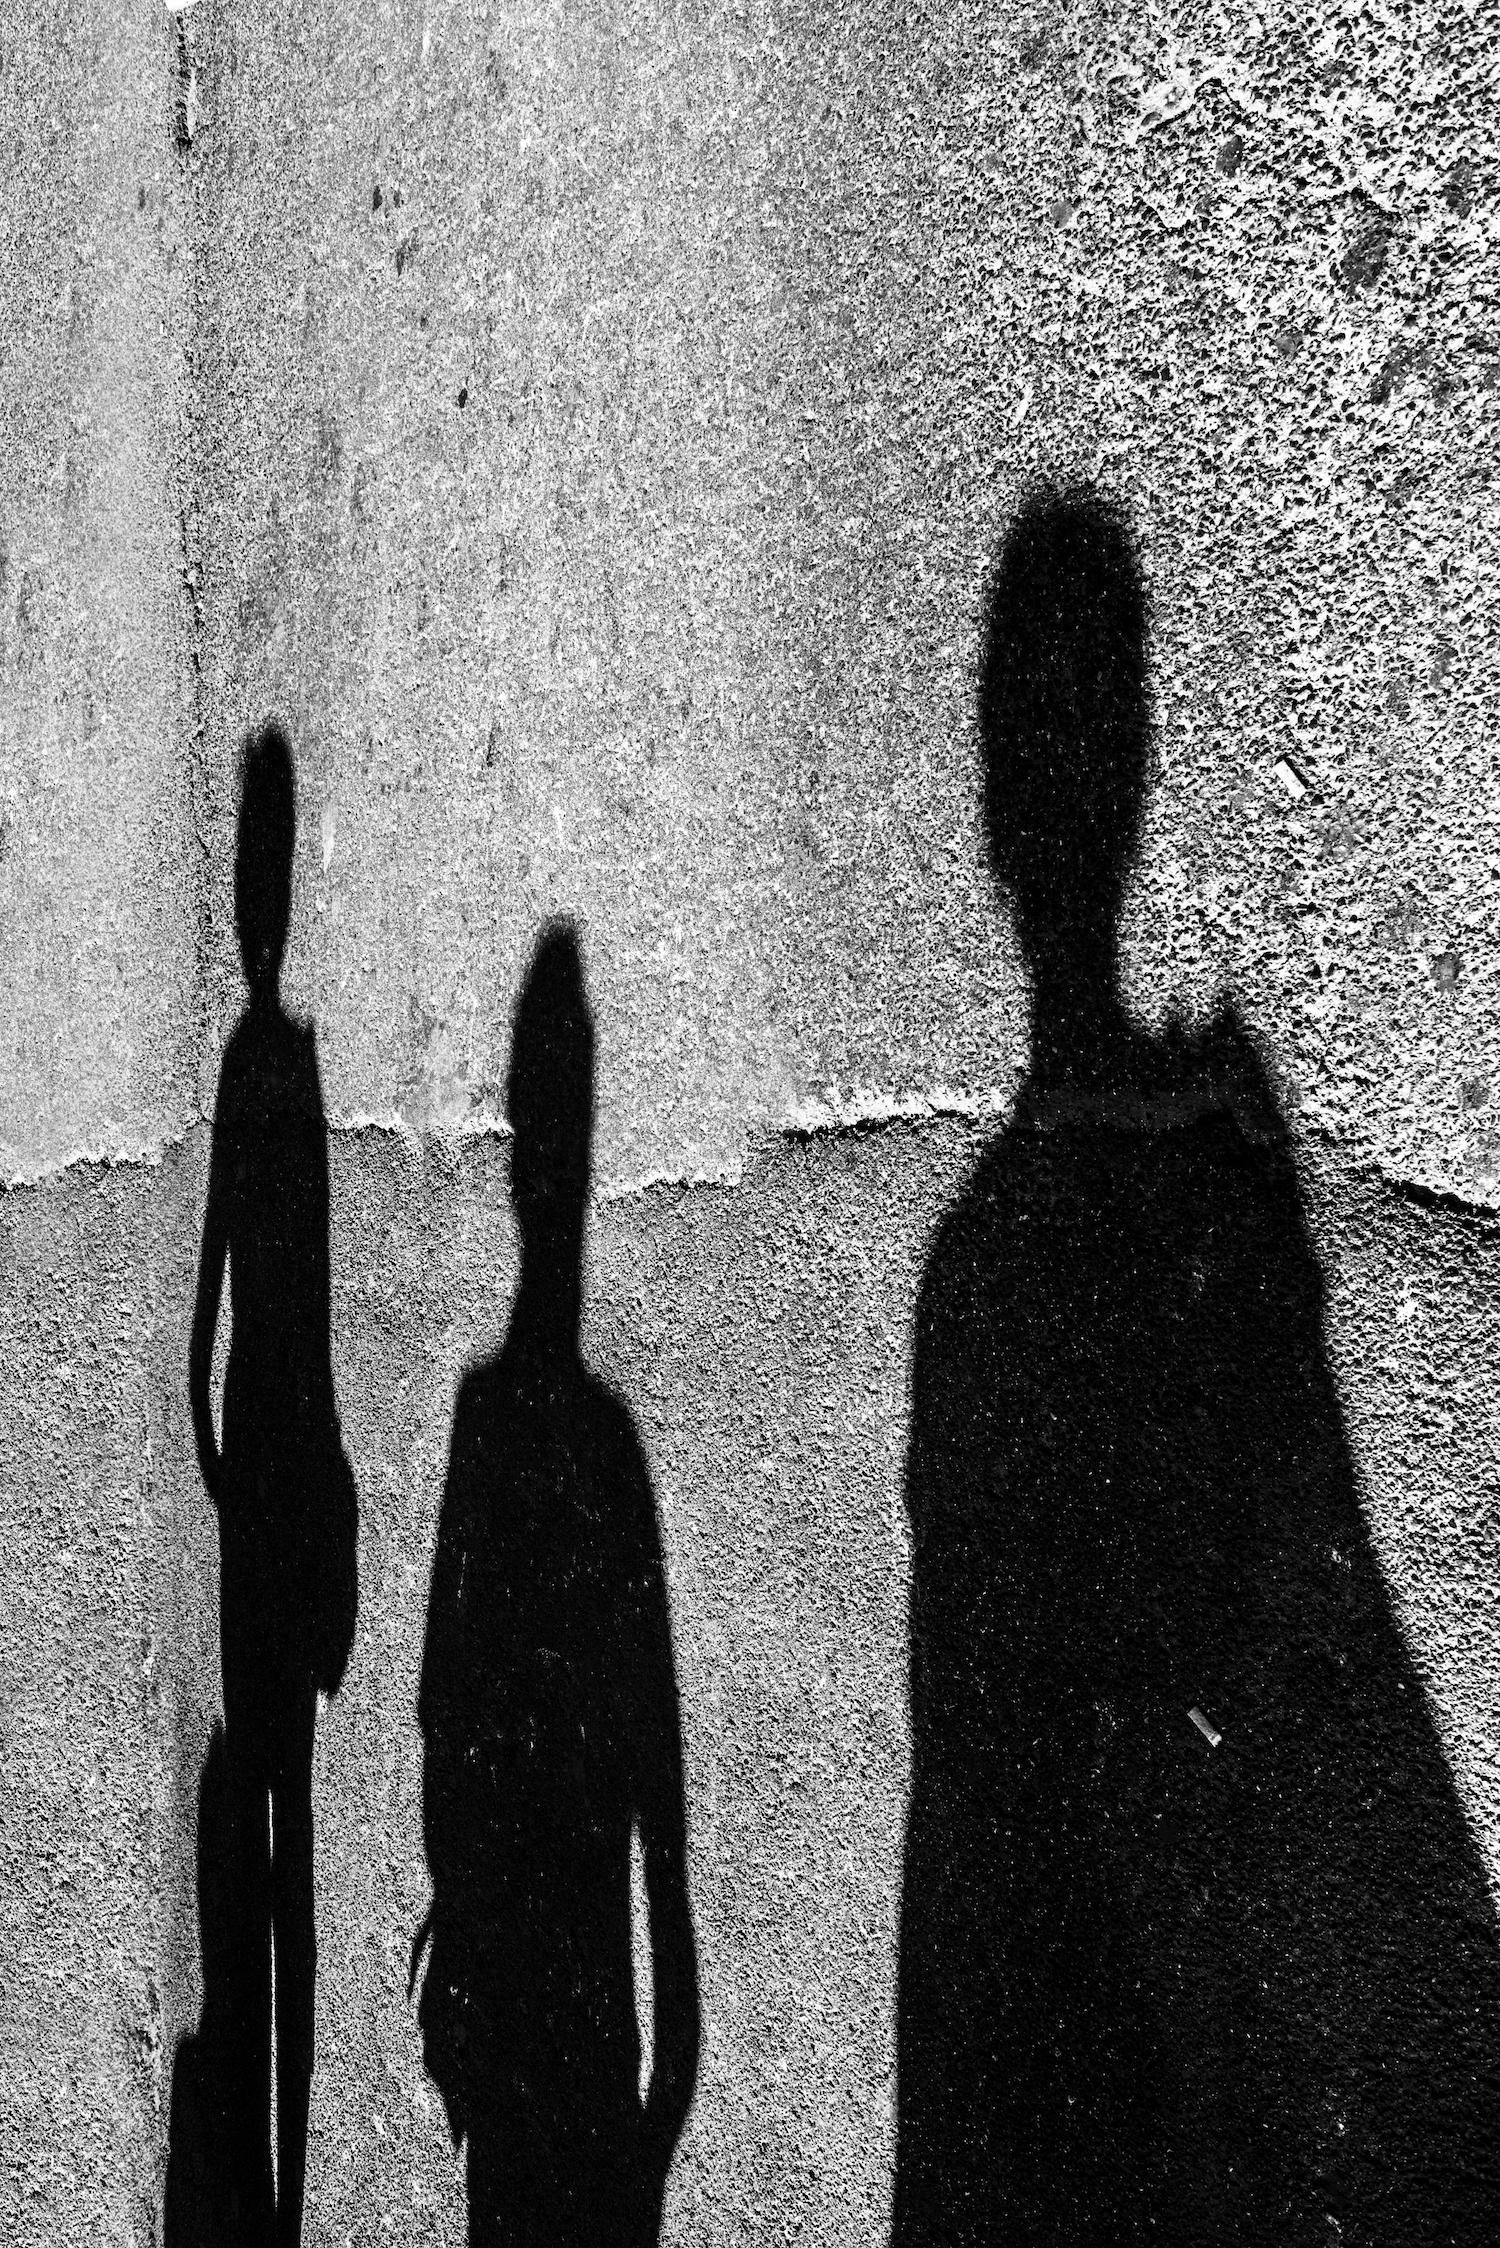 © Simone Foglia | Hidden Identities